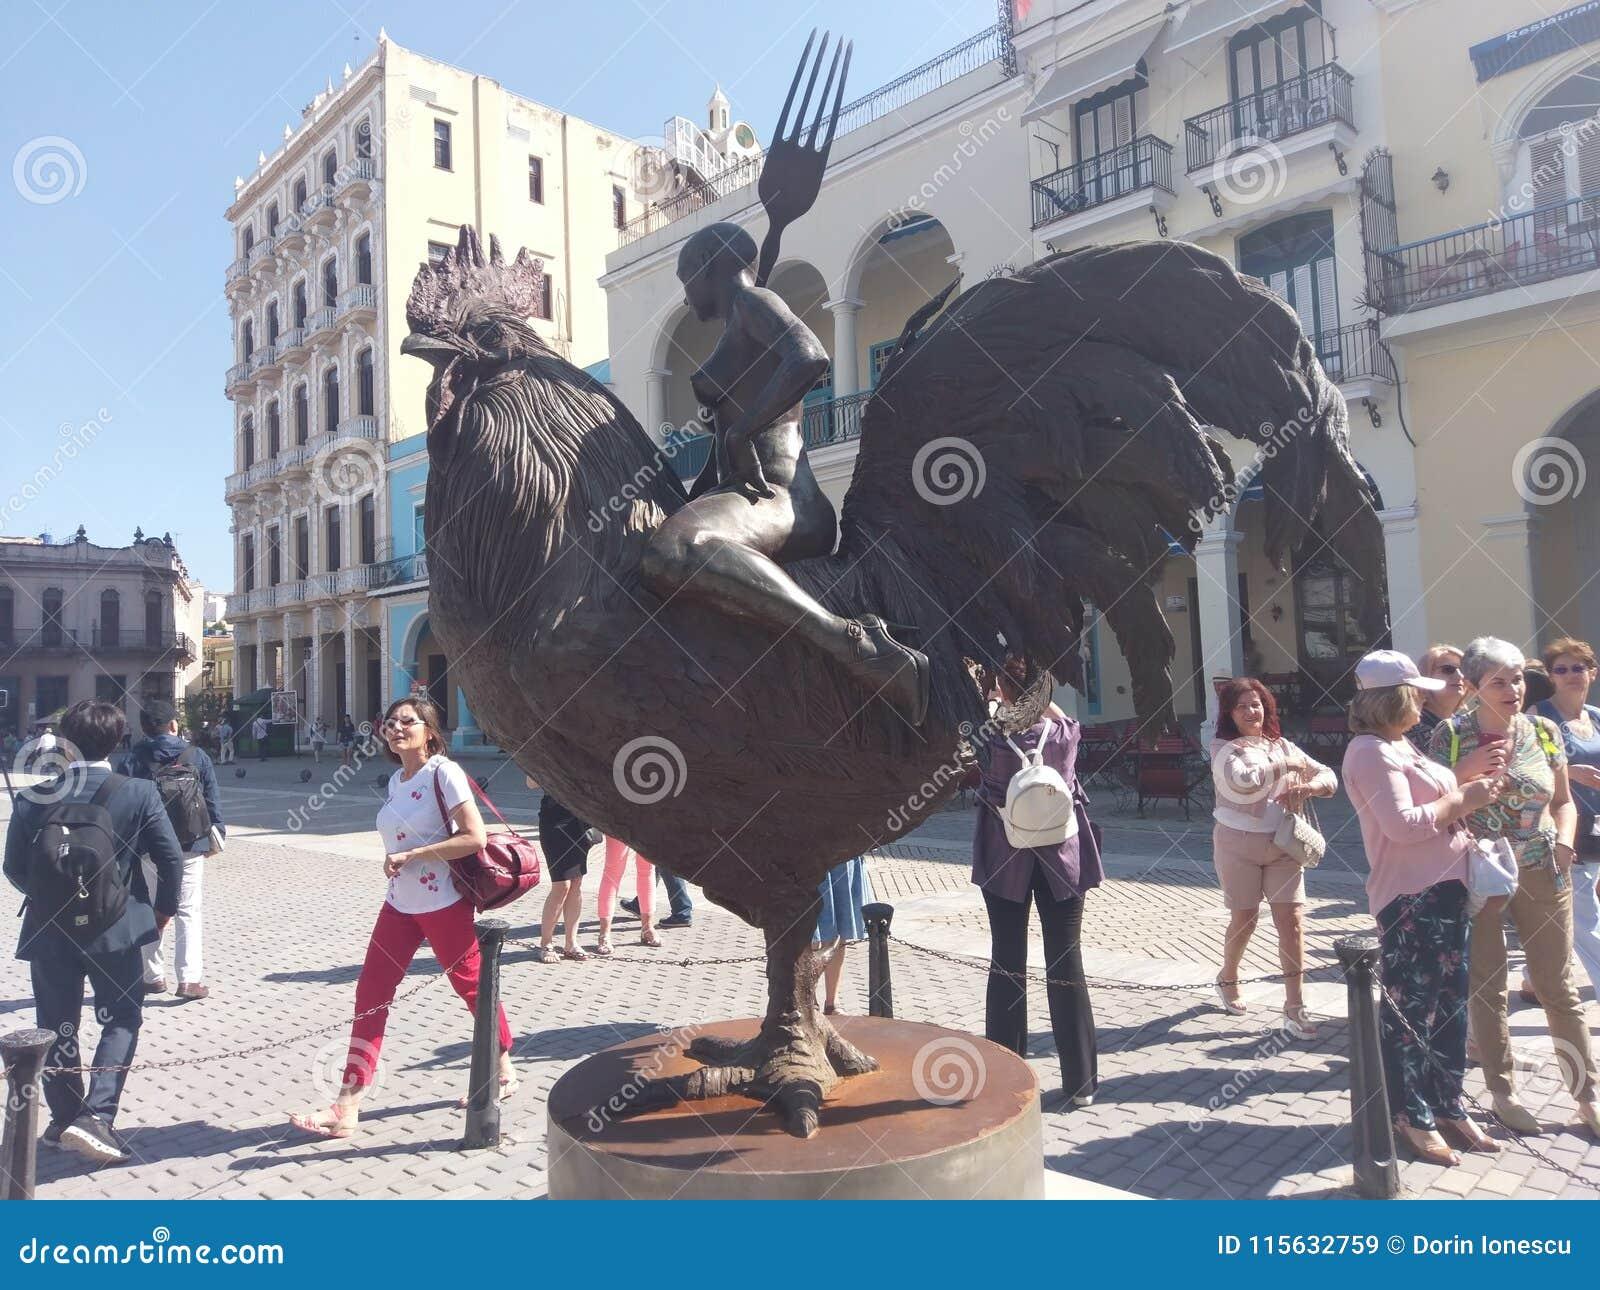 statue, sculpture, monument, tourism, recreation, cock, pedestal, plinth, footstall